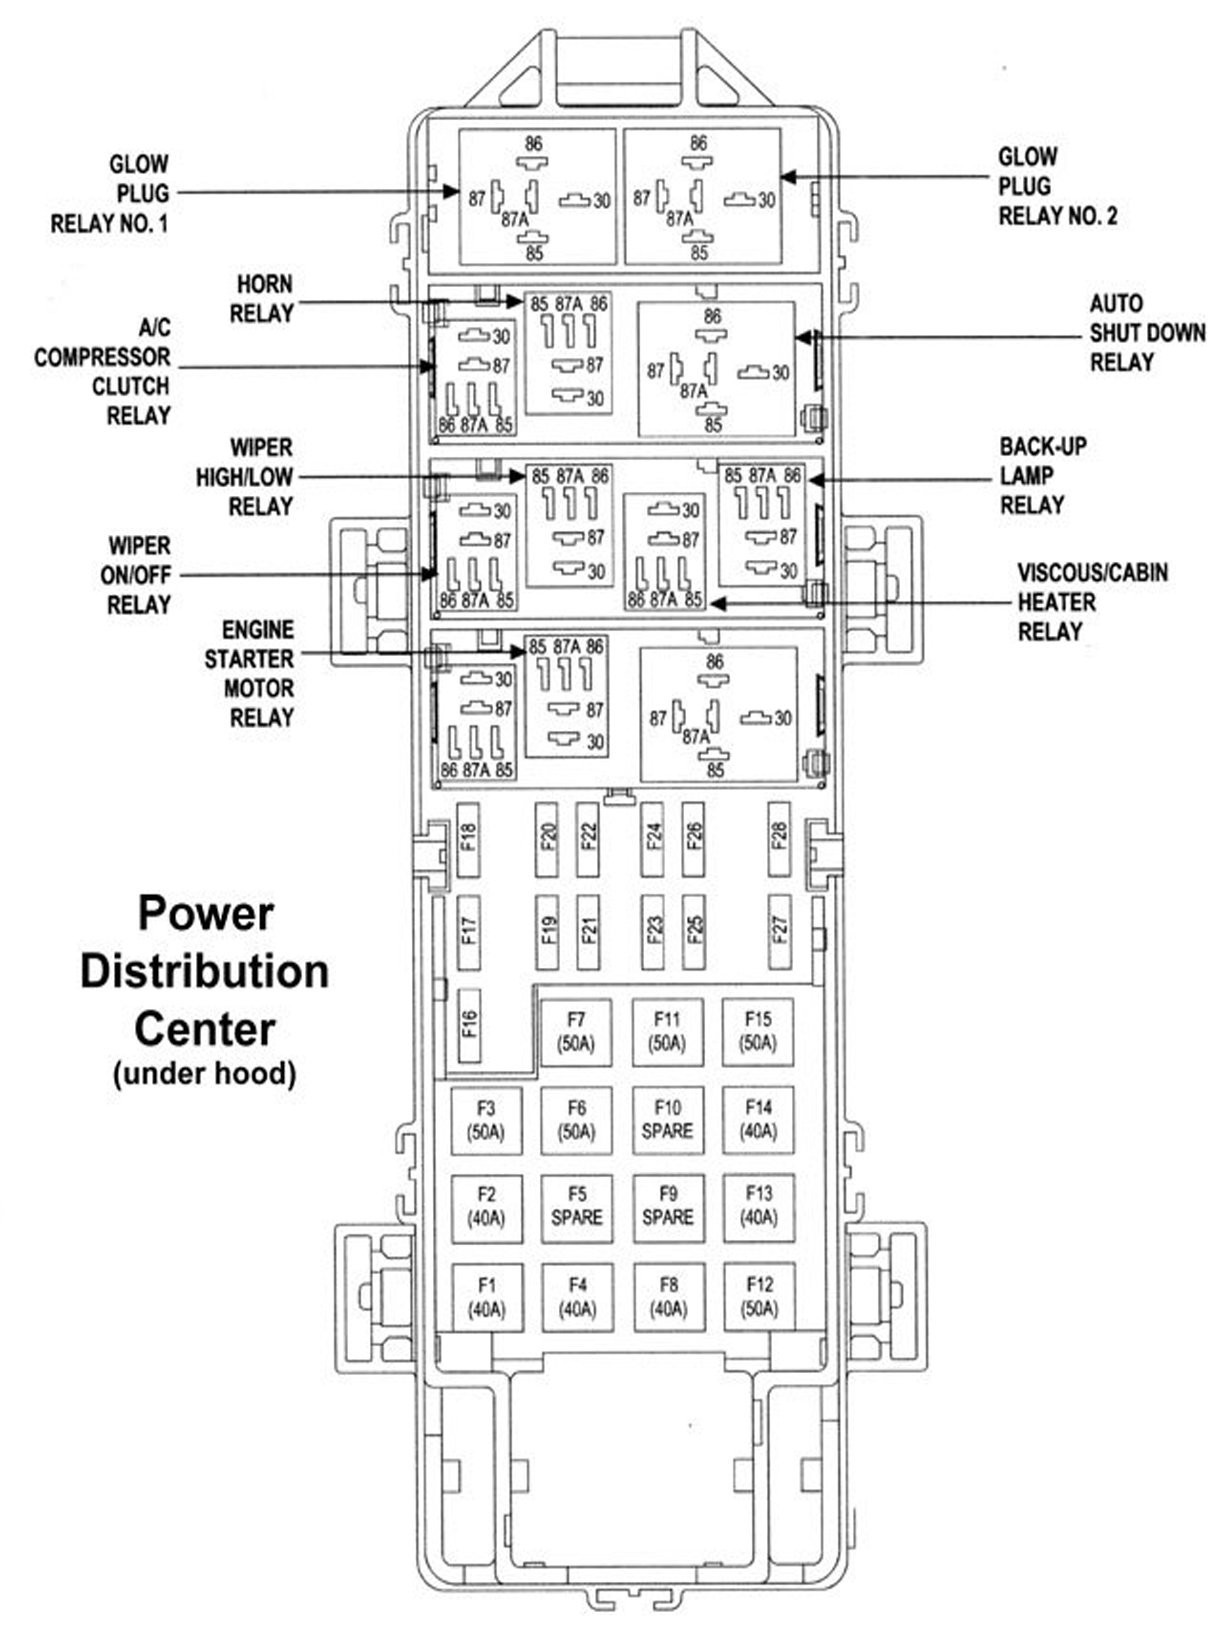 2002 jeep grand cherokee wiring diagram 1991 s10 headlight switch engine my